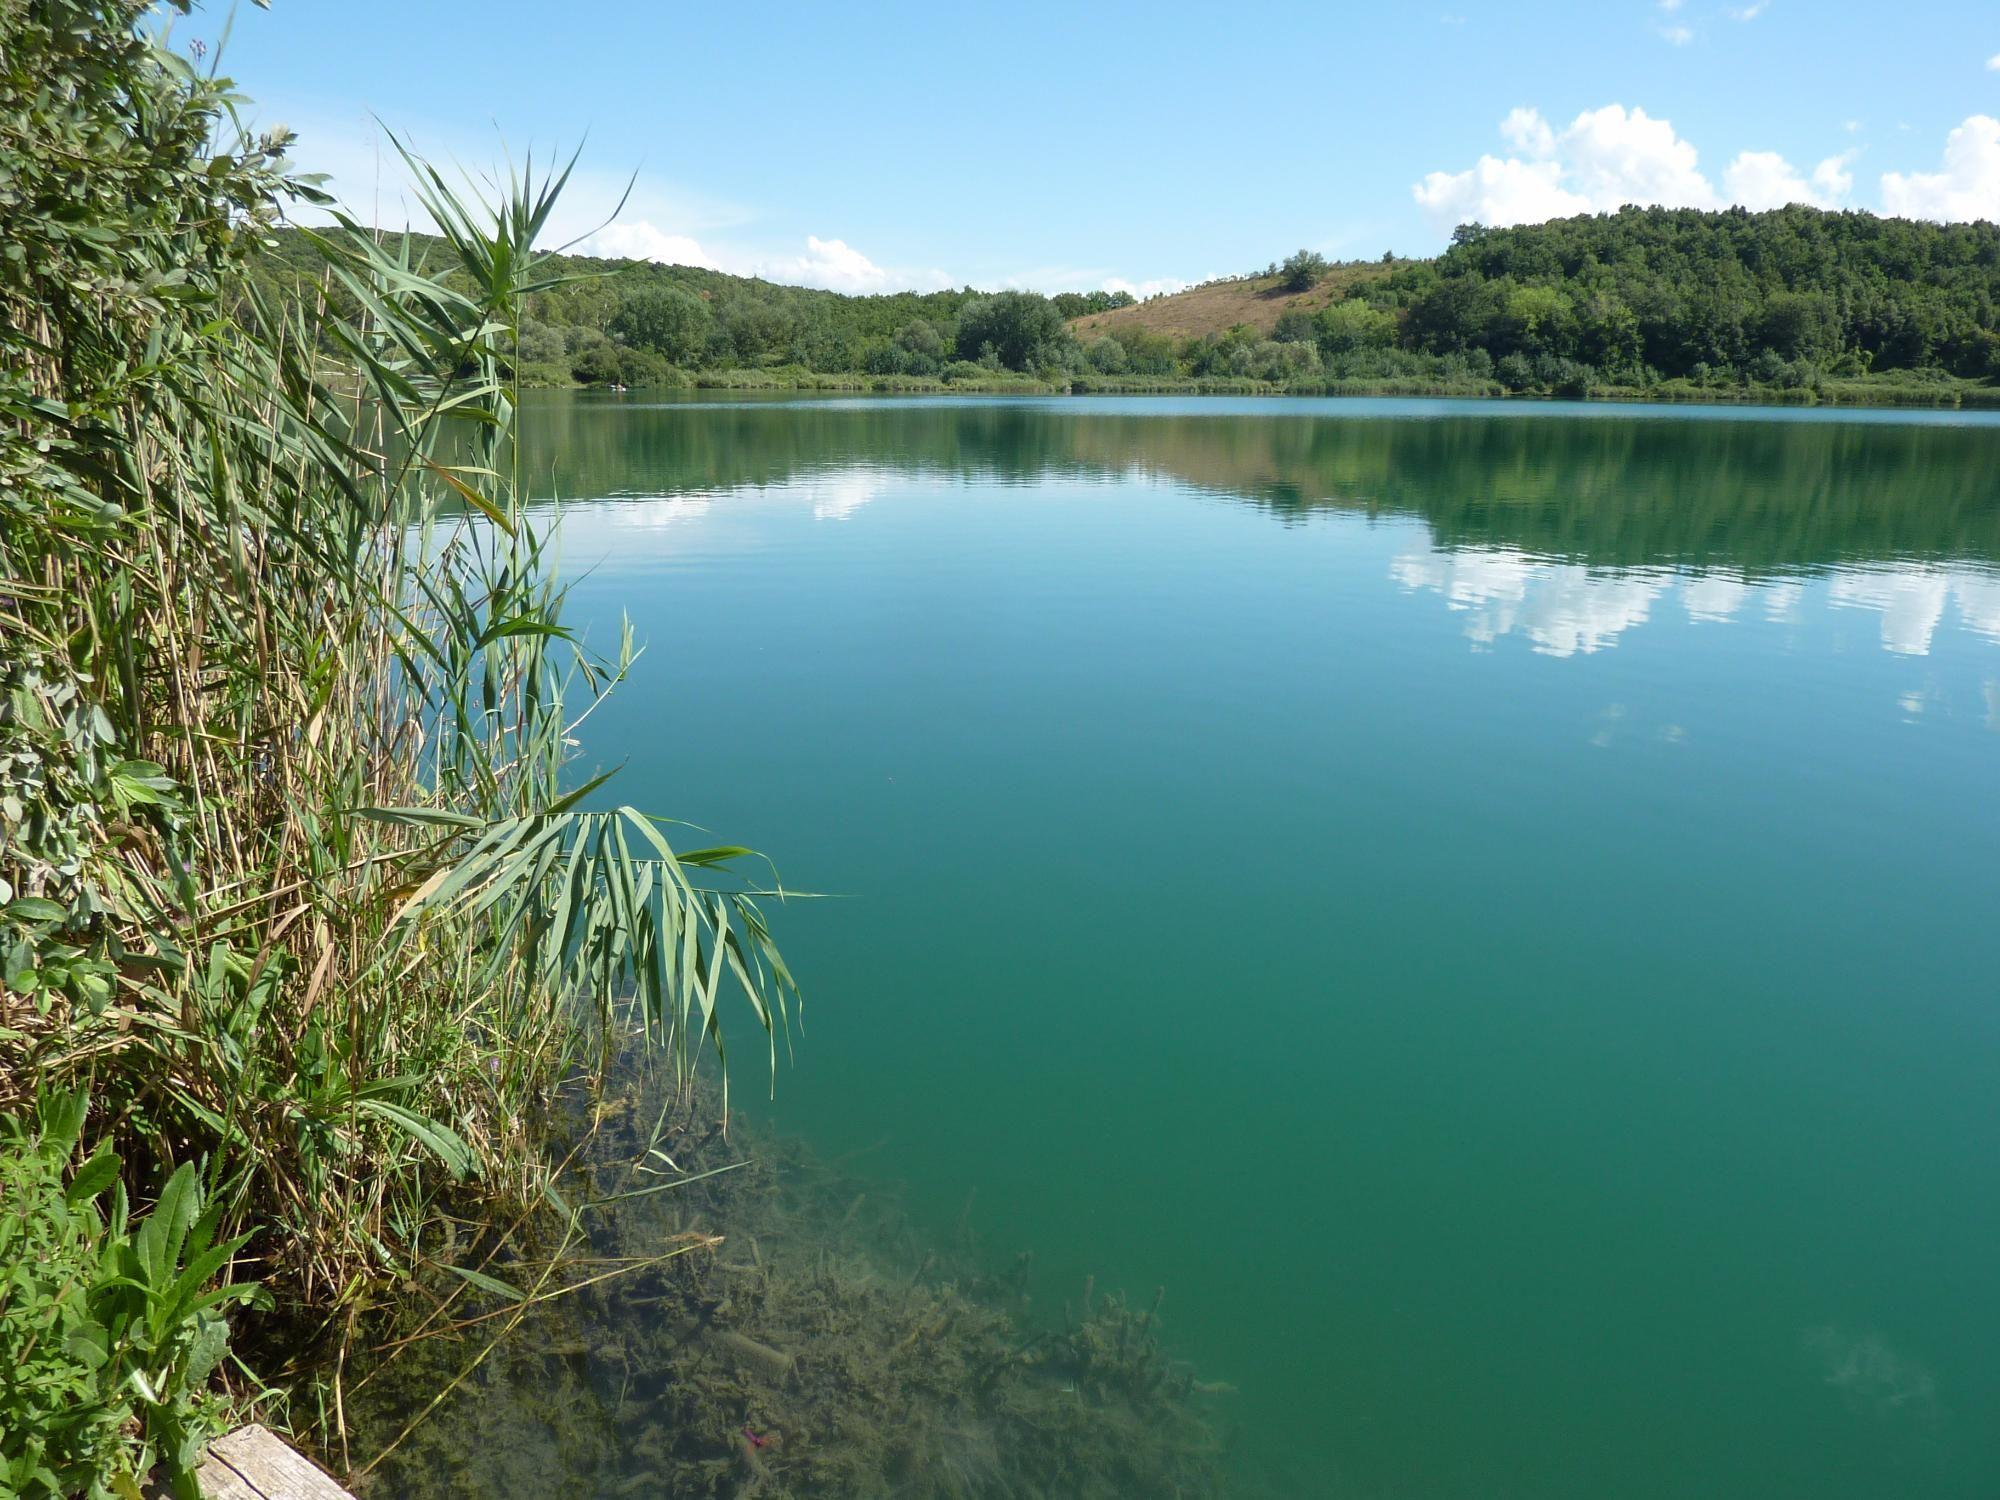 Lago dell'Accesa (Massa Marittima, Italy): Top Tips Before You Go - TripAdvisor